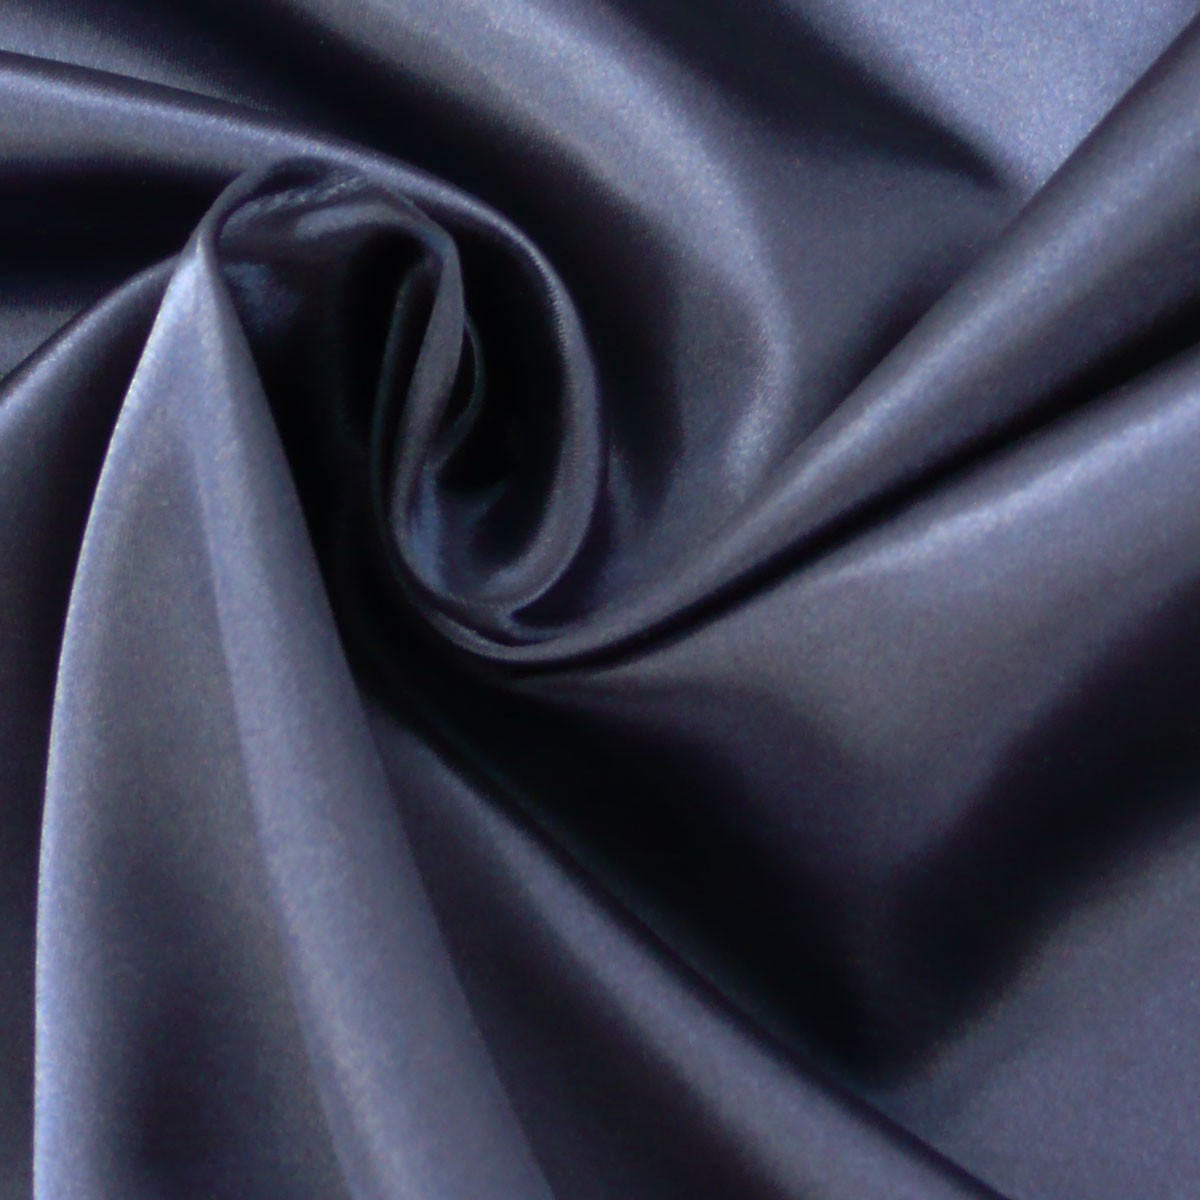 Kreativstoff Satinstoff einfarbig dunkelblau 1,4m Breite